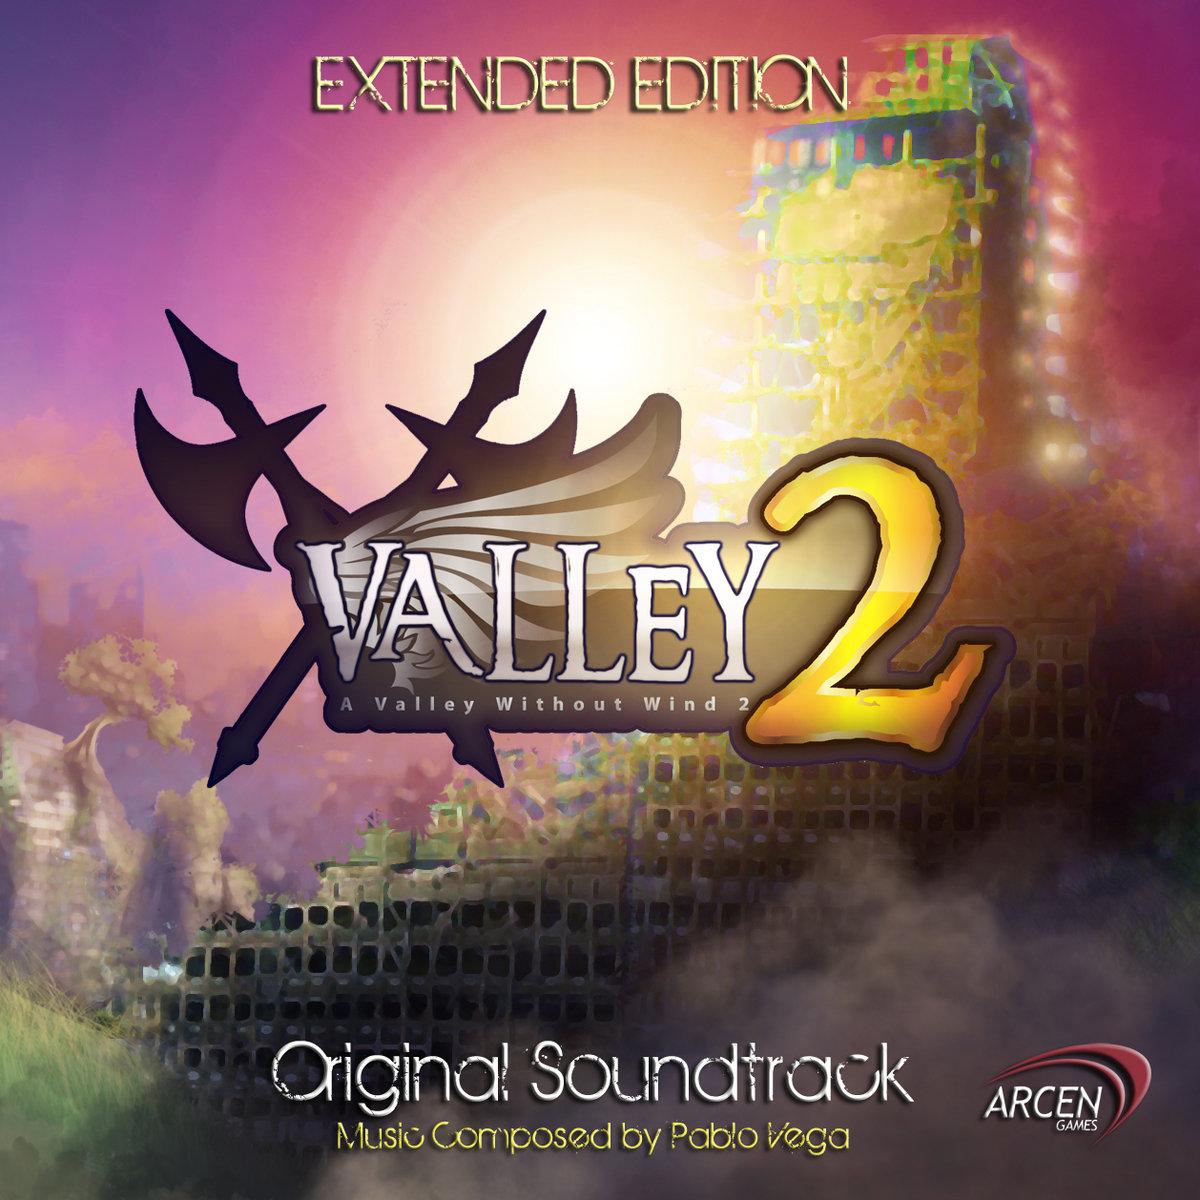 AVWW 2 Theme [Bonus Track] | Pablo Vega